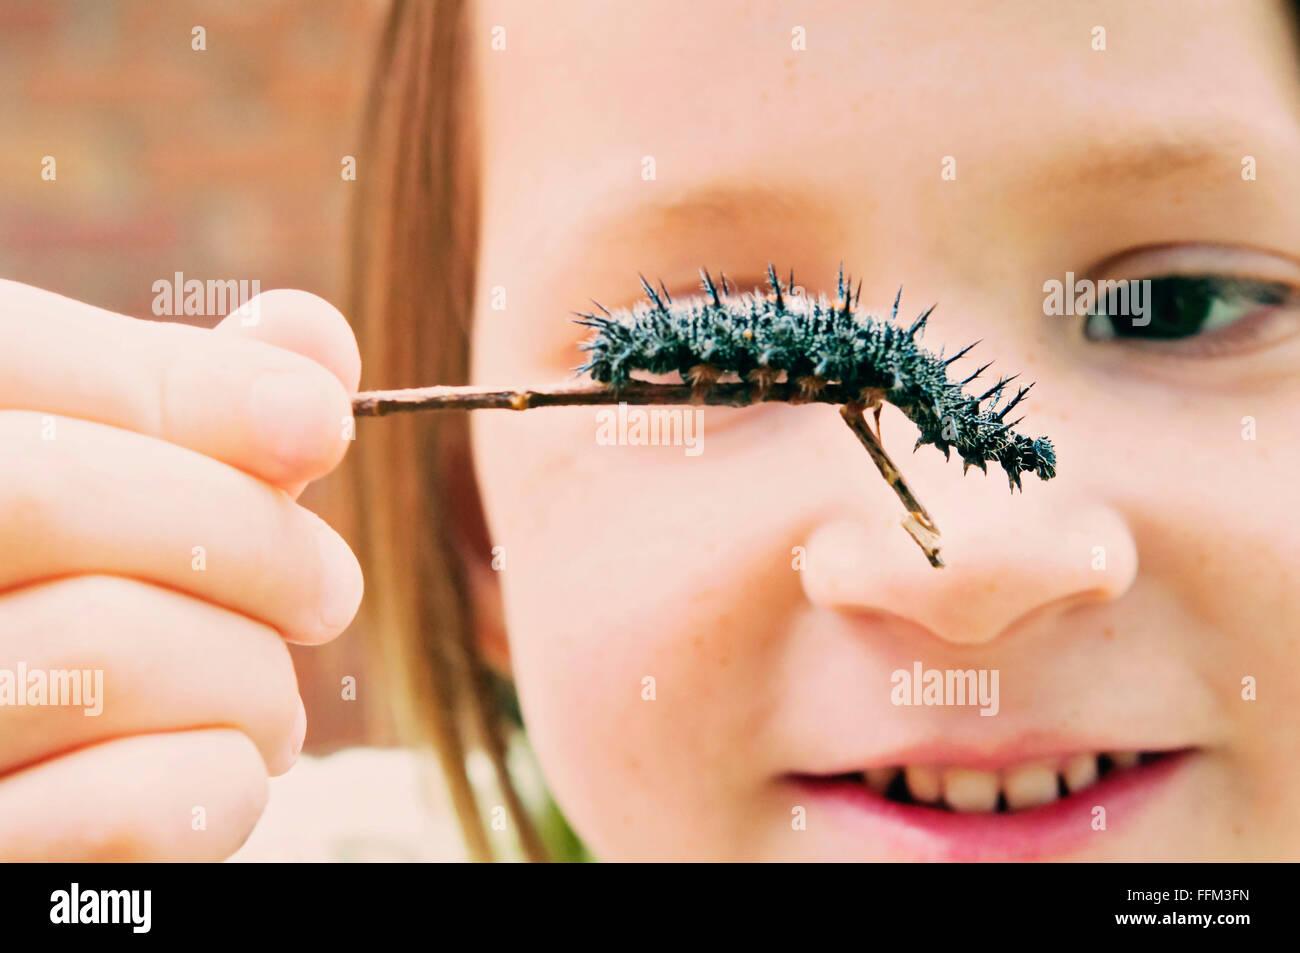 Girl holding peacock Caterpillar Photo Stock